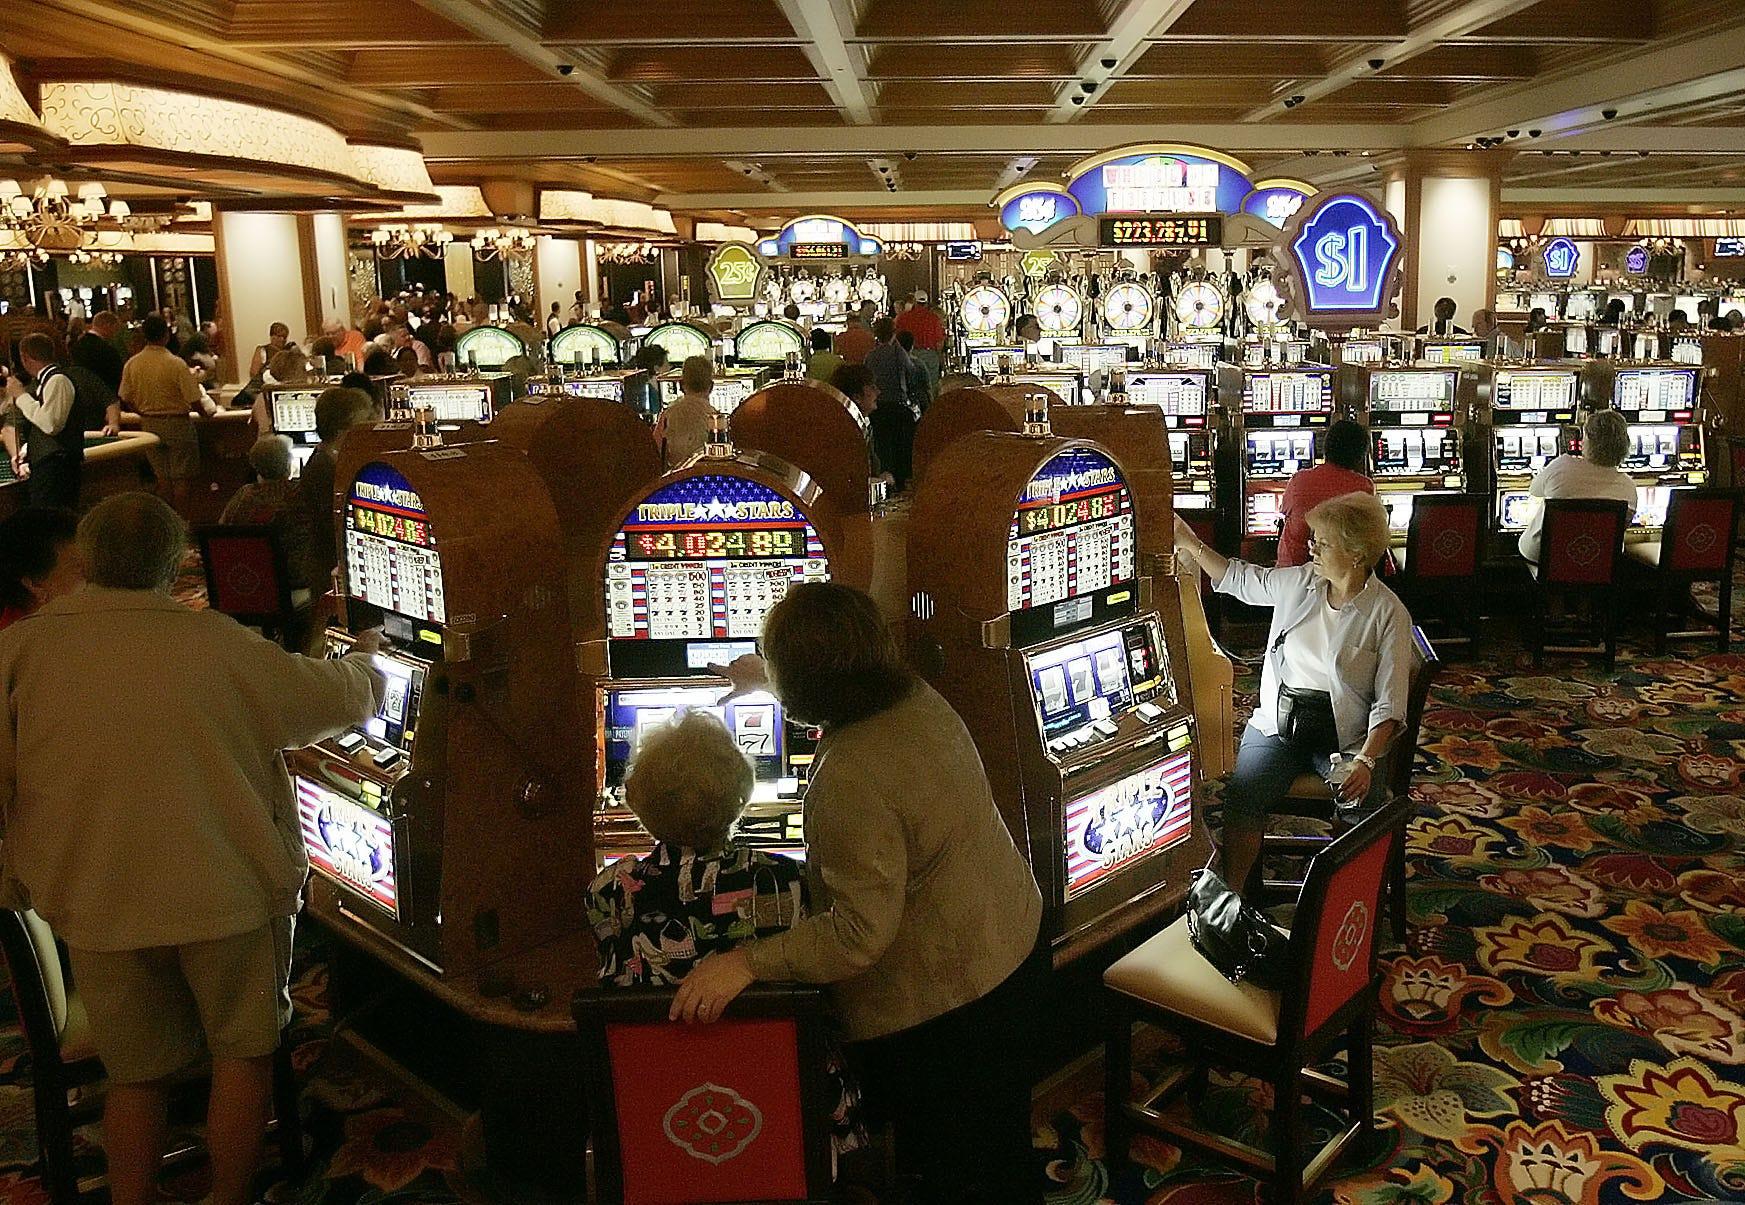 Casino rule gambling testimony